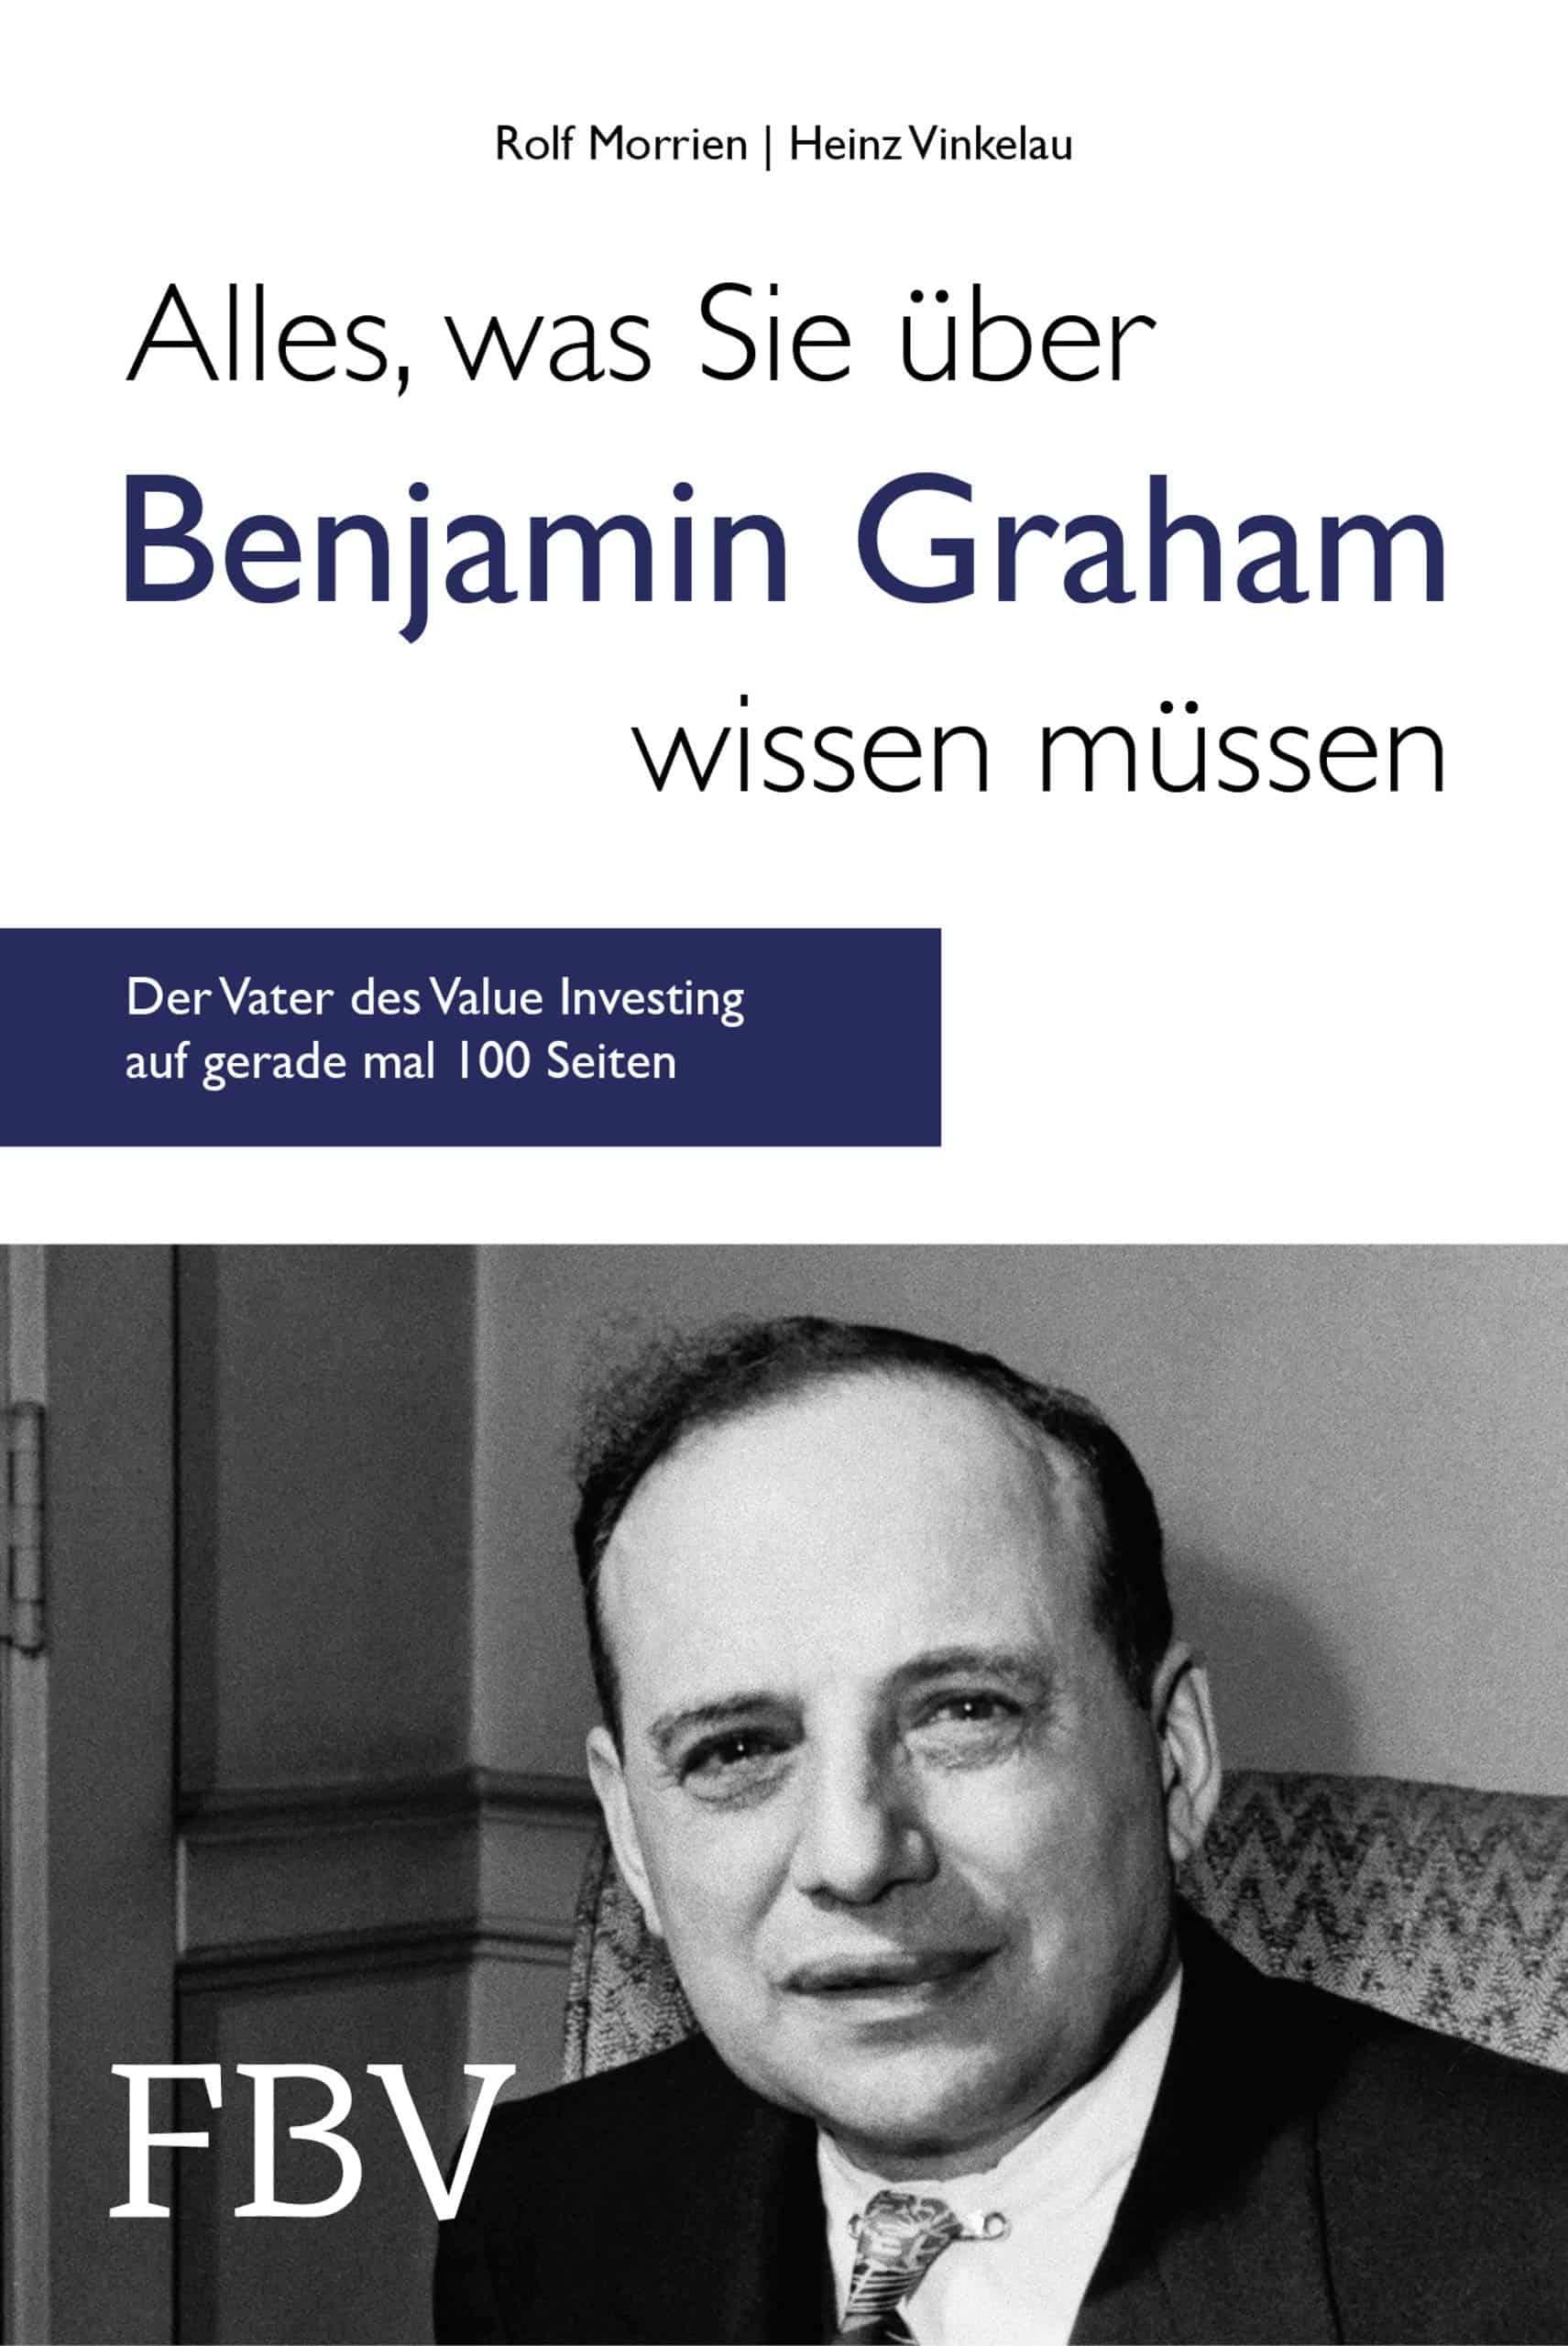 Alles_über_Benjamin_Graham